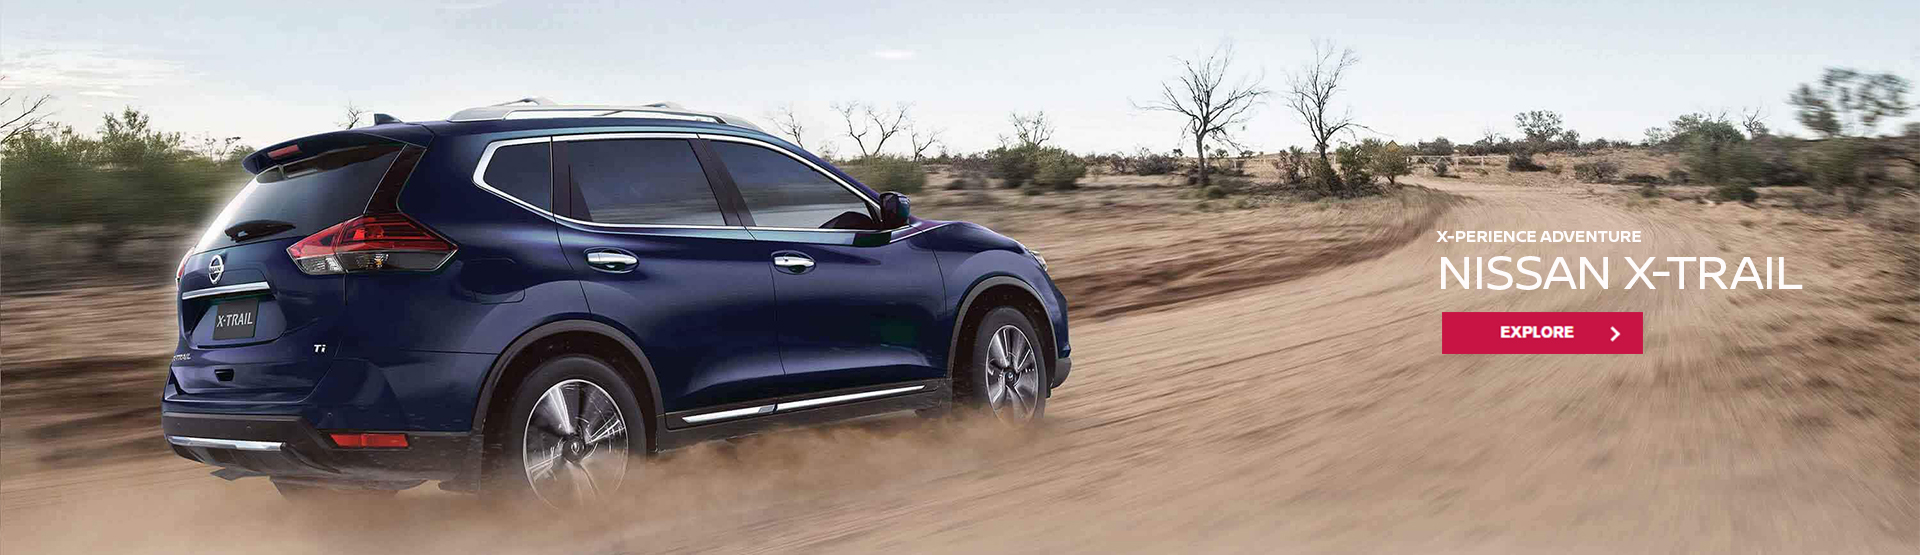 x-perience adventure. Nissan X-trail. Explore now